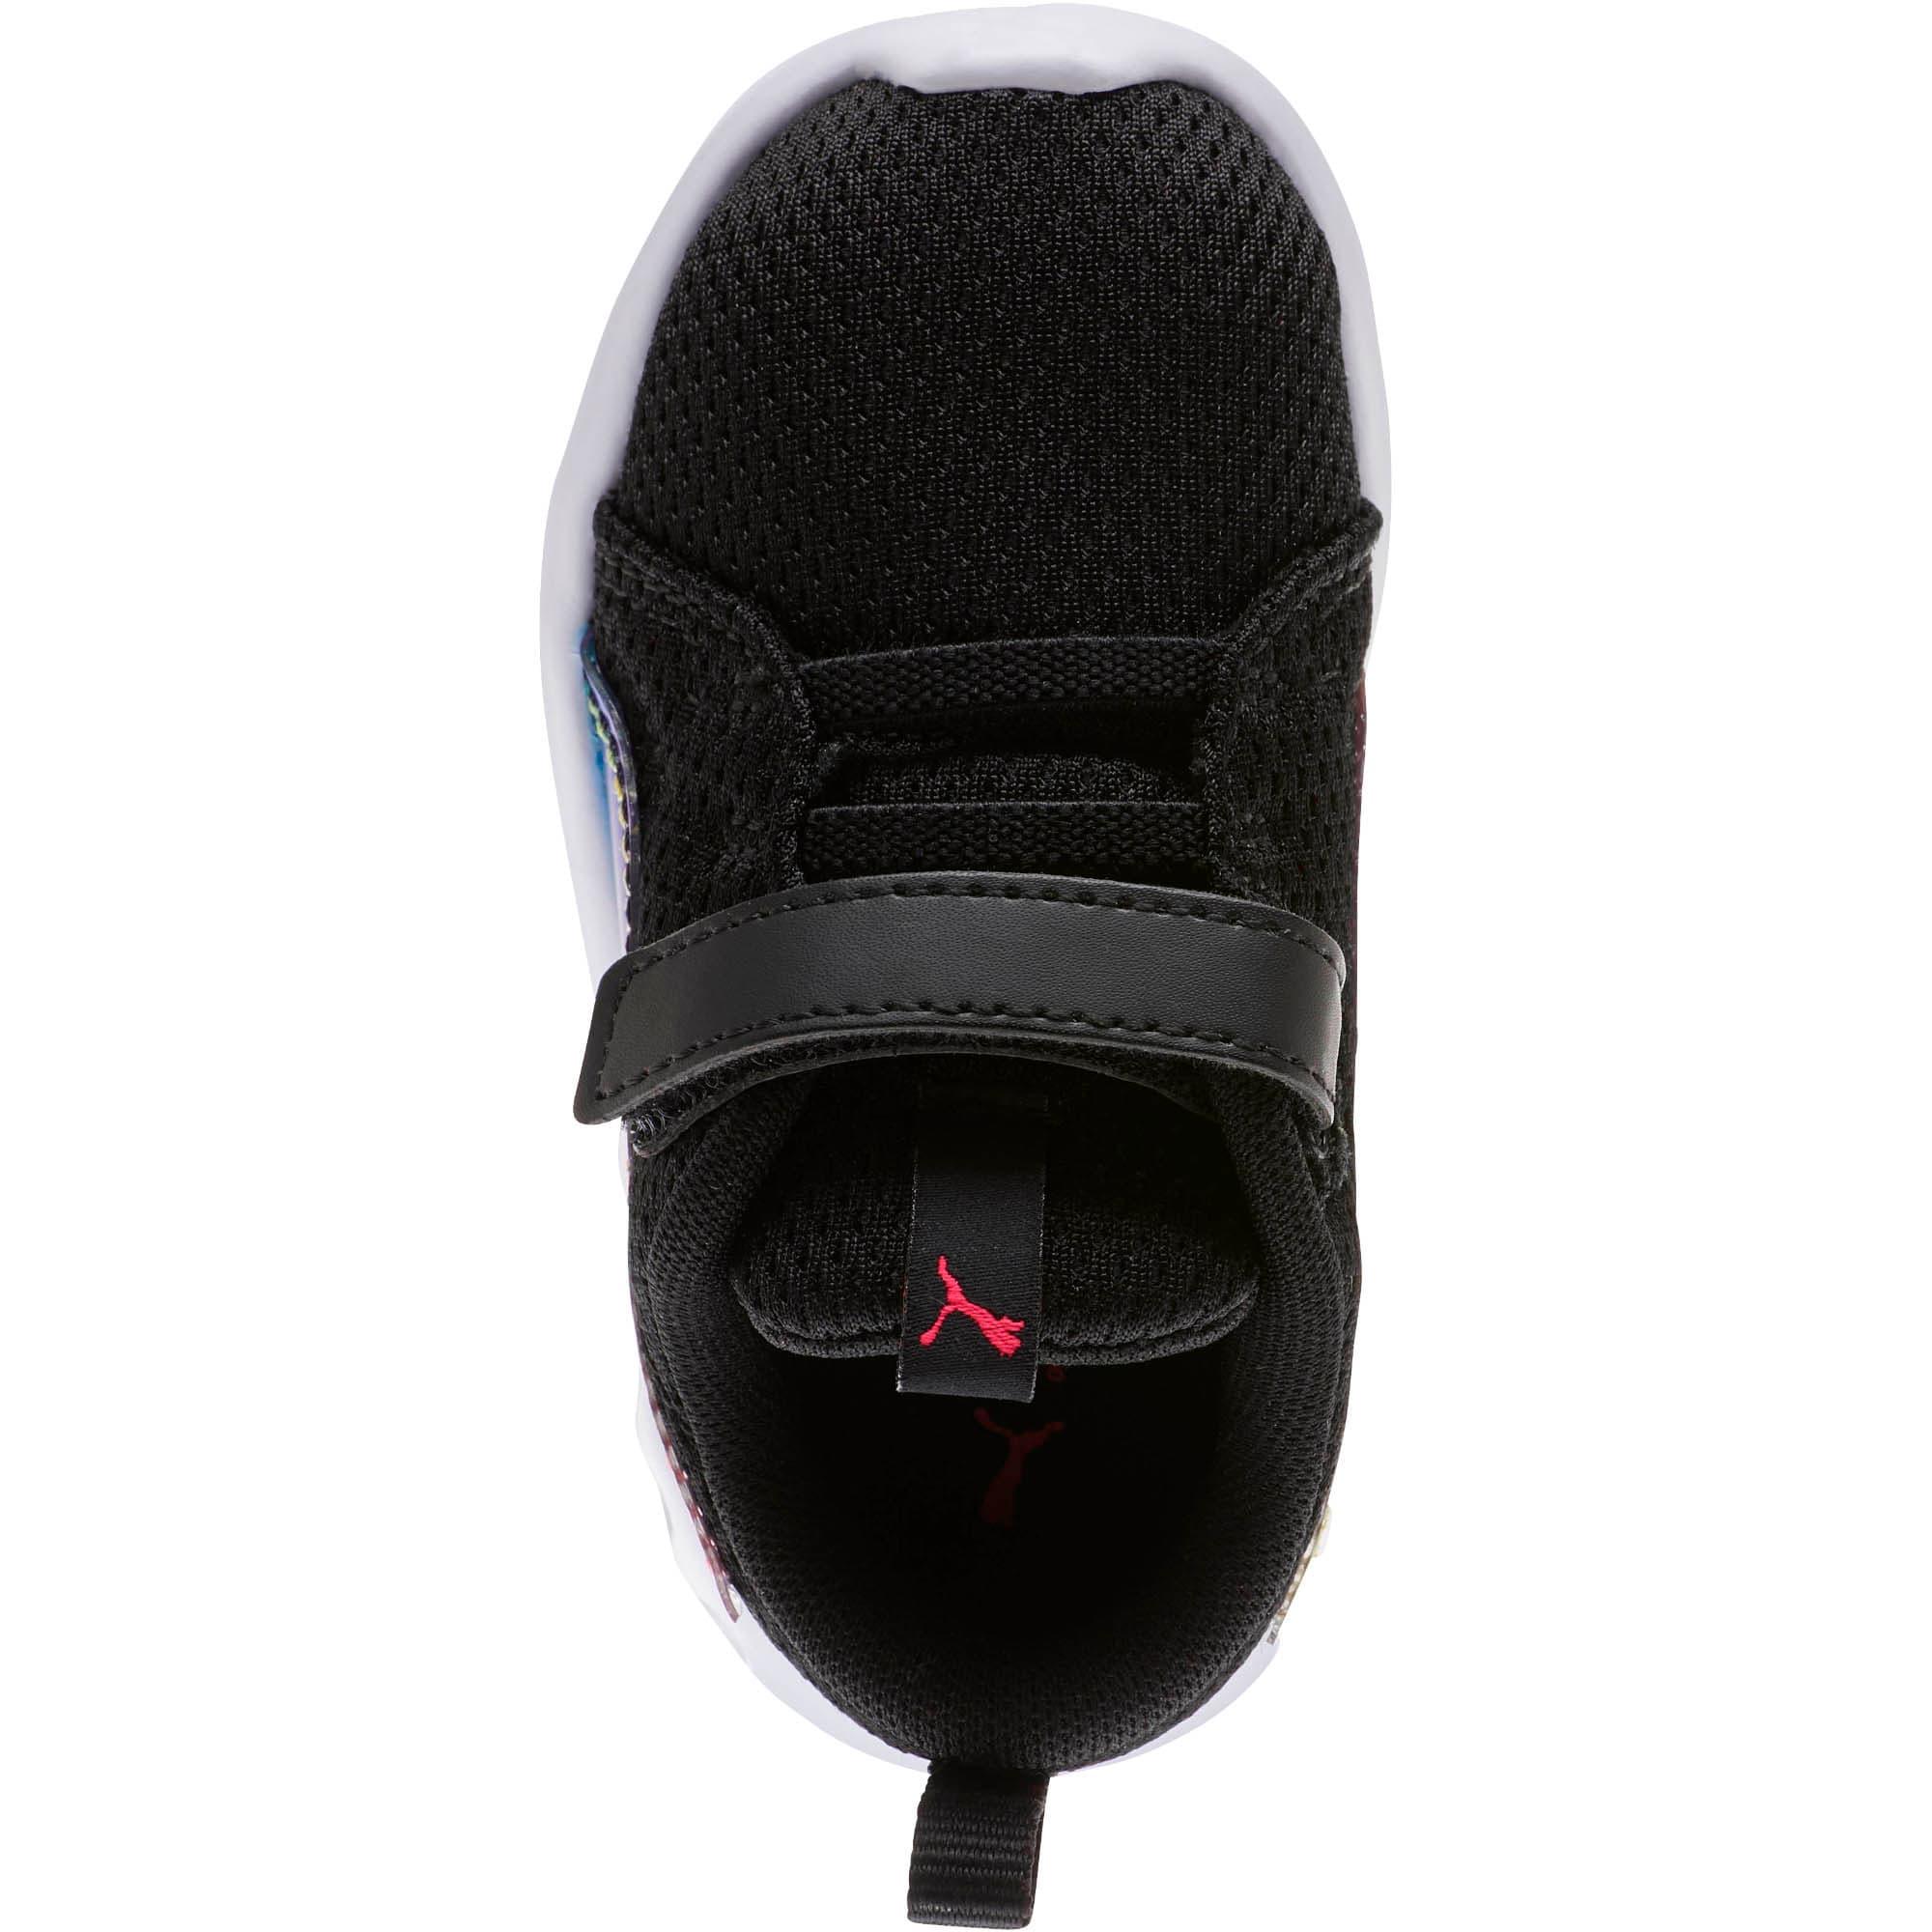 Thumbnail 5 of Carson 2 Iridescent Toddler Shoes, Puma Black-Puma White, medium